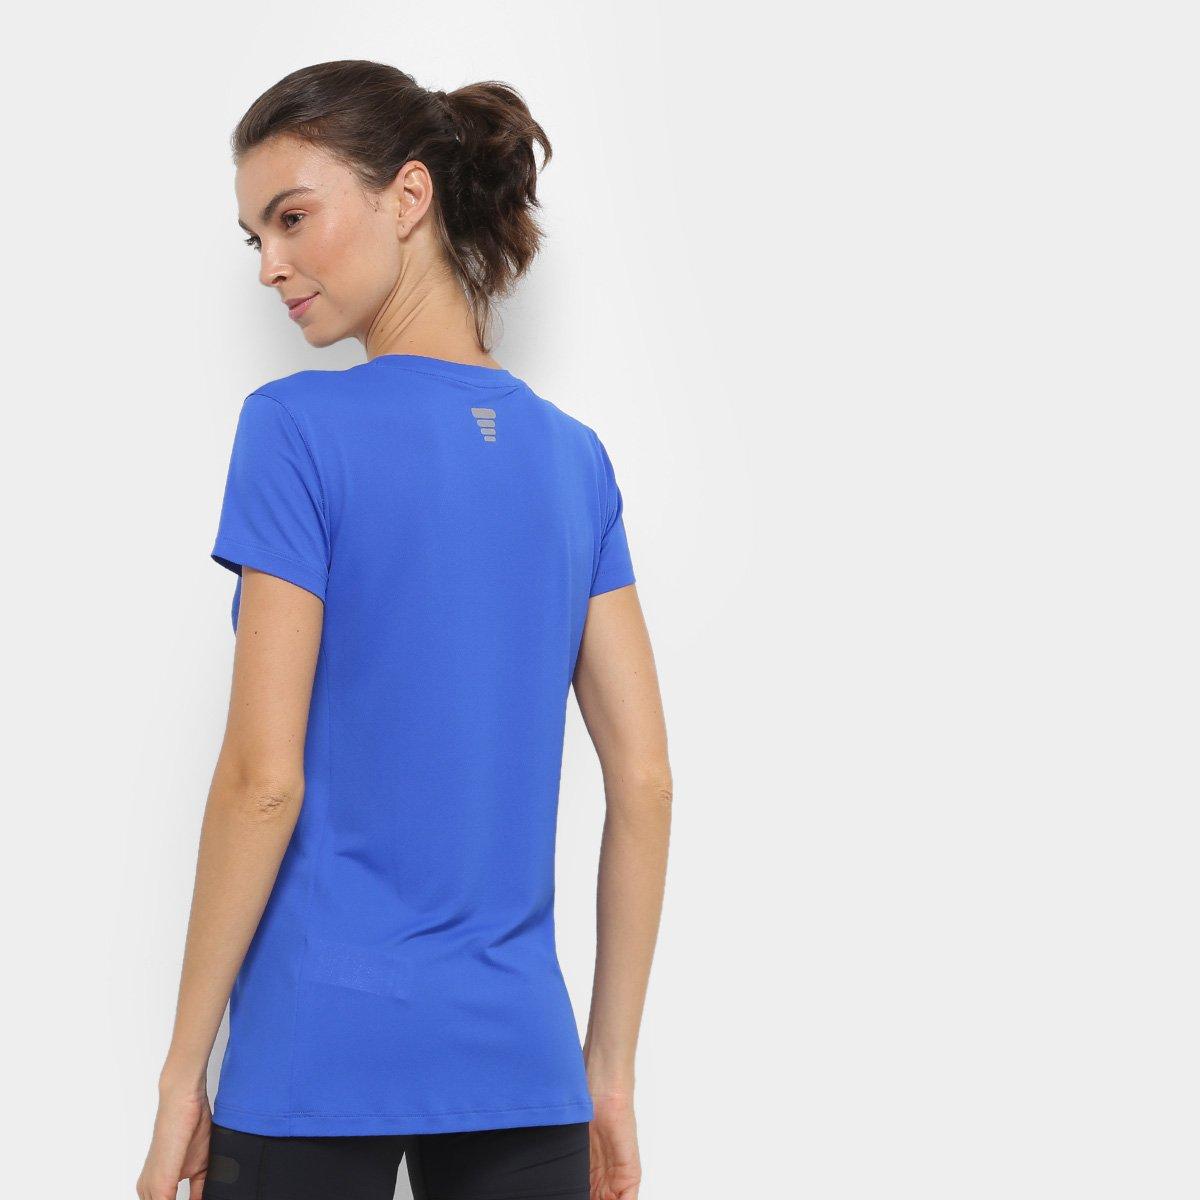 Camiseta Fila Basic Light 2 Feminina - Azul Royal - Compre Agora ... 94e8ba8193055